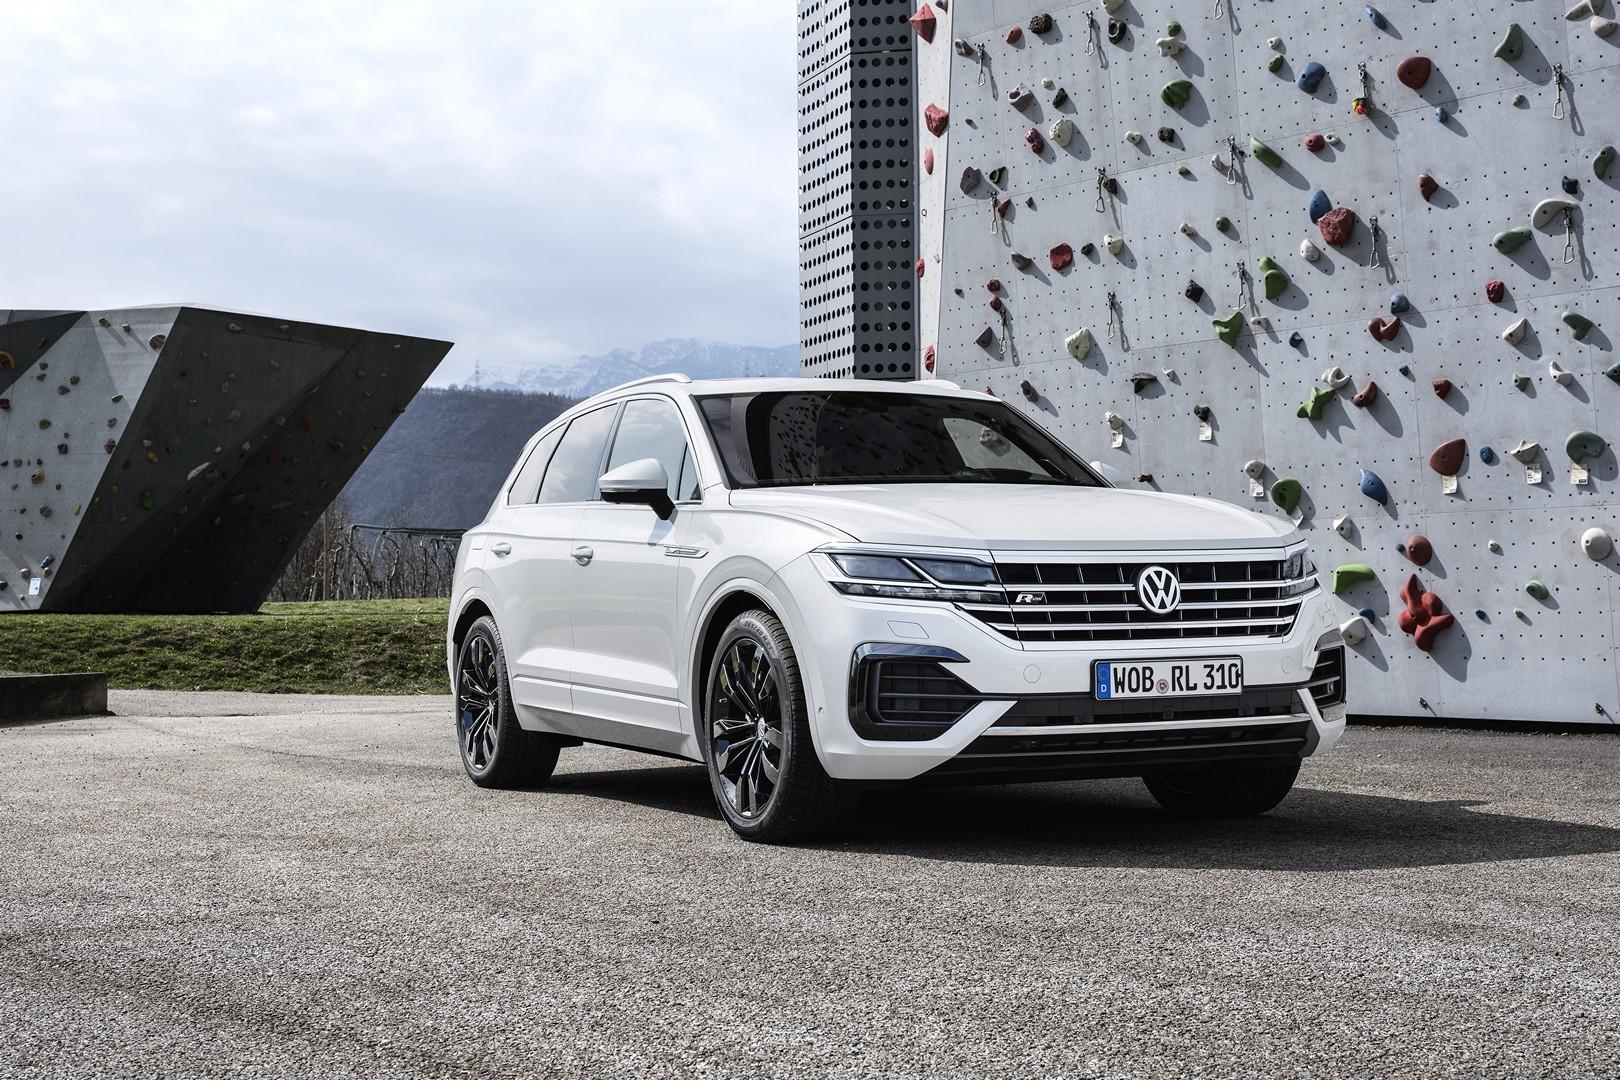 2019 Volkswagen Touareg Is Better than Mercedes GLE, But ...